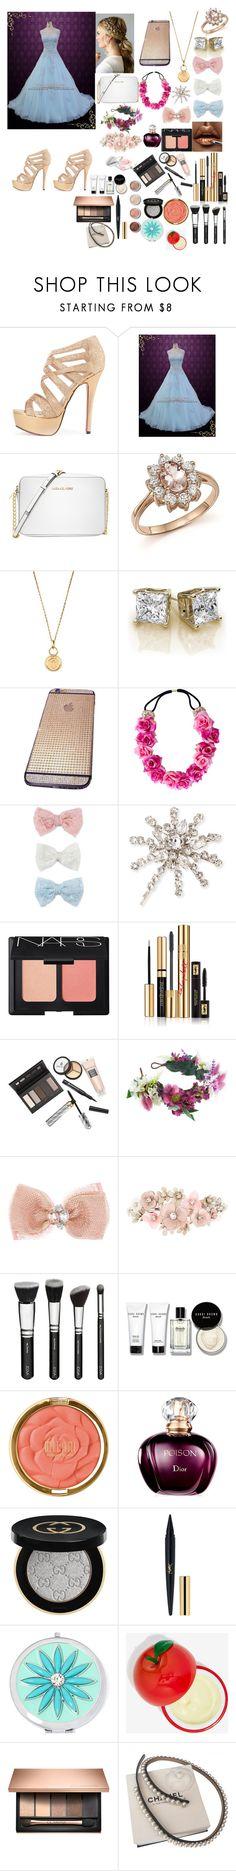 """Bridesmaid♥♥♥♥"" by fashion-dora15 ❤ liked on Polyvore featuring Michael Kors, Bloomingdale's, Aurélie Bidermann, Decree, Jennifer Behr, NARS Cosmetics, Yves Saint Laurent, Borghese, Rock 'N Rose and Monsoon"